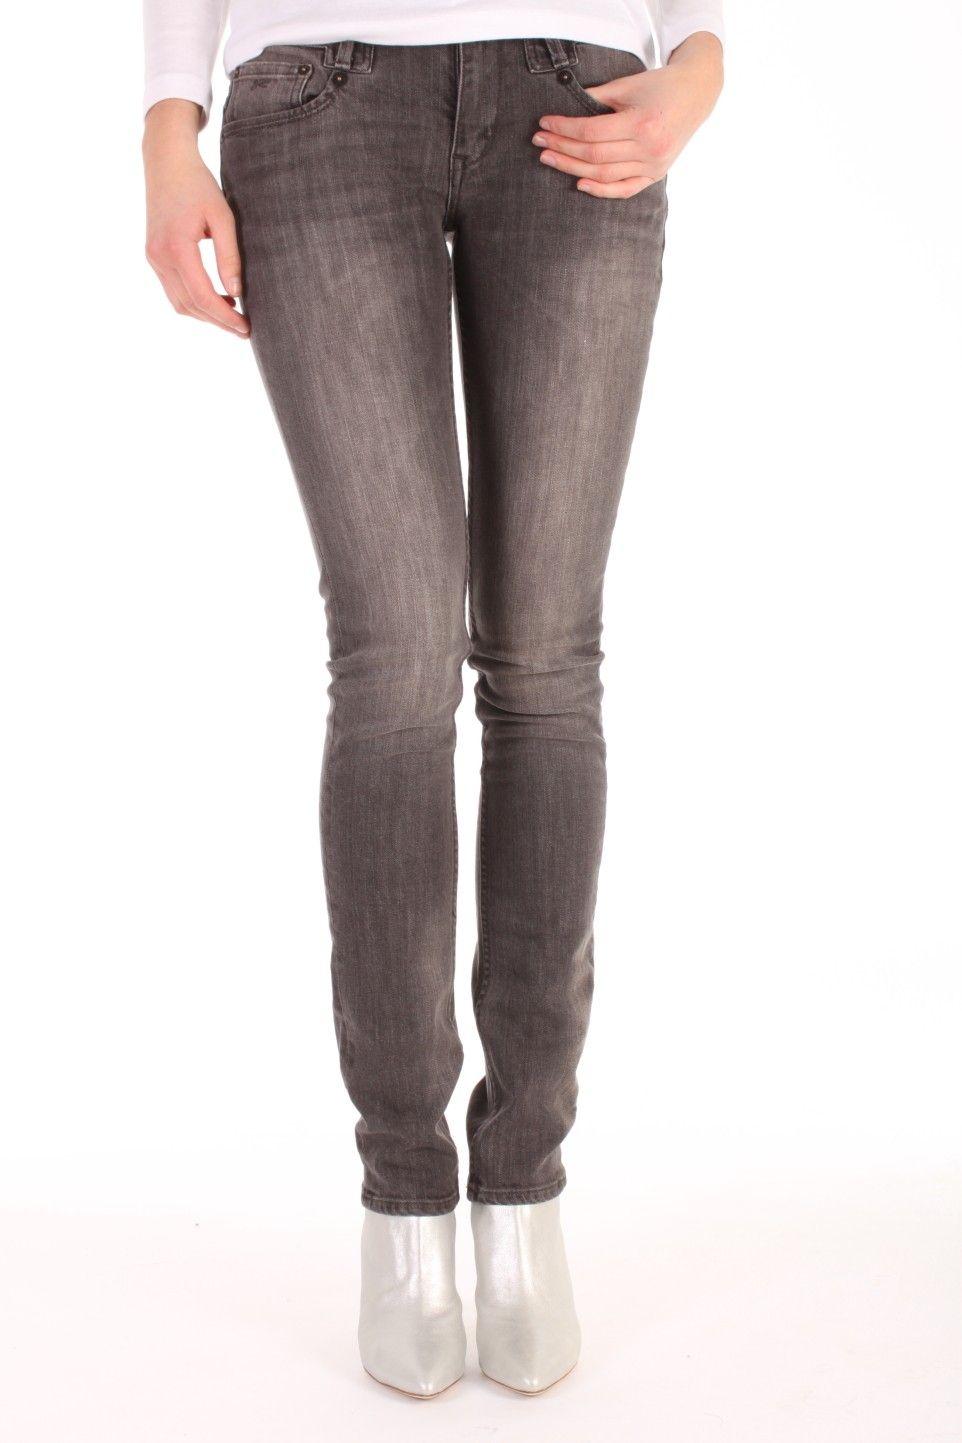 Deze Skinny+ VGS2 van Denham is gemaakt van katoen met elasthan. Het is een skinny fit met de bekende 7-point backpockets.  Skinny+ VGS2 - 02-13-11-11-004.